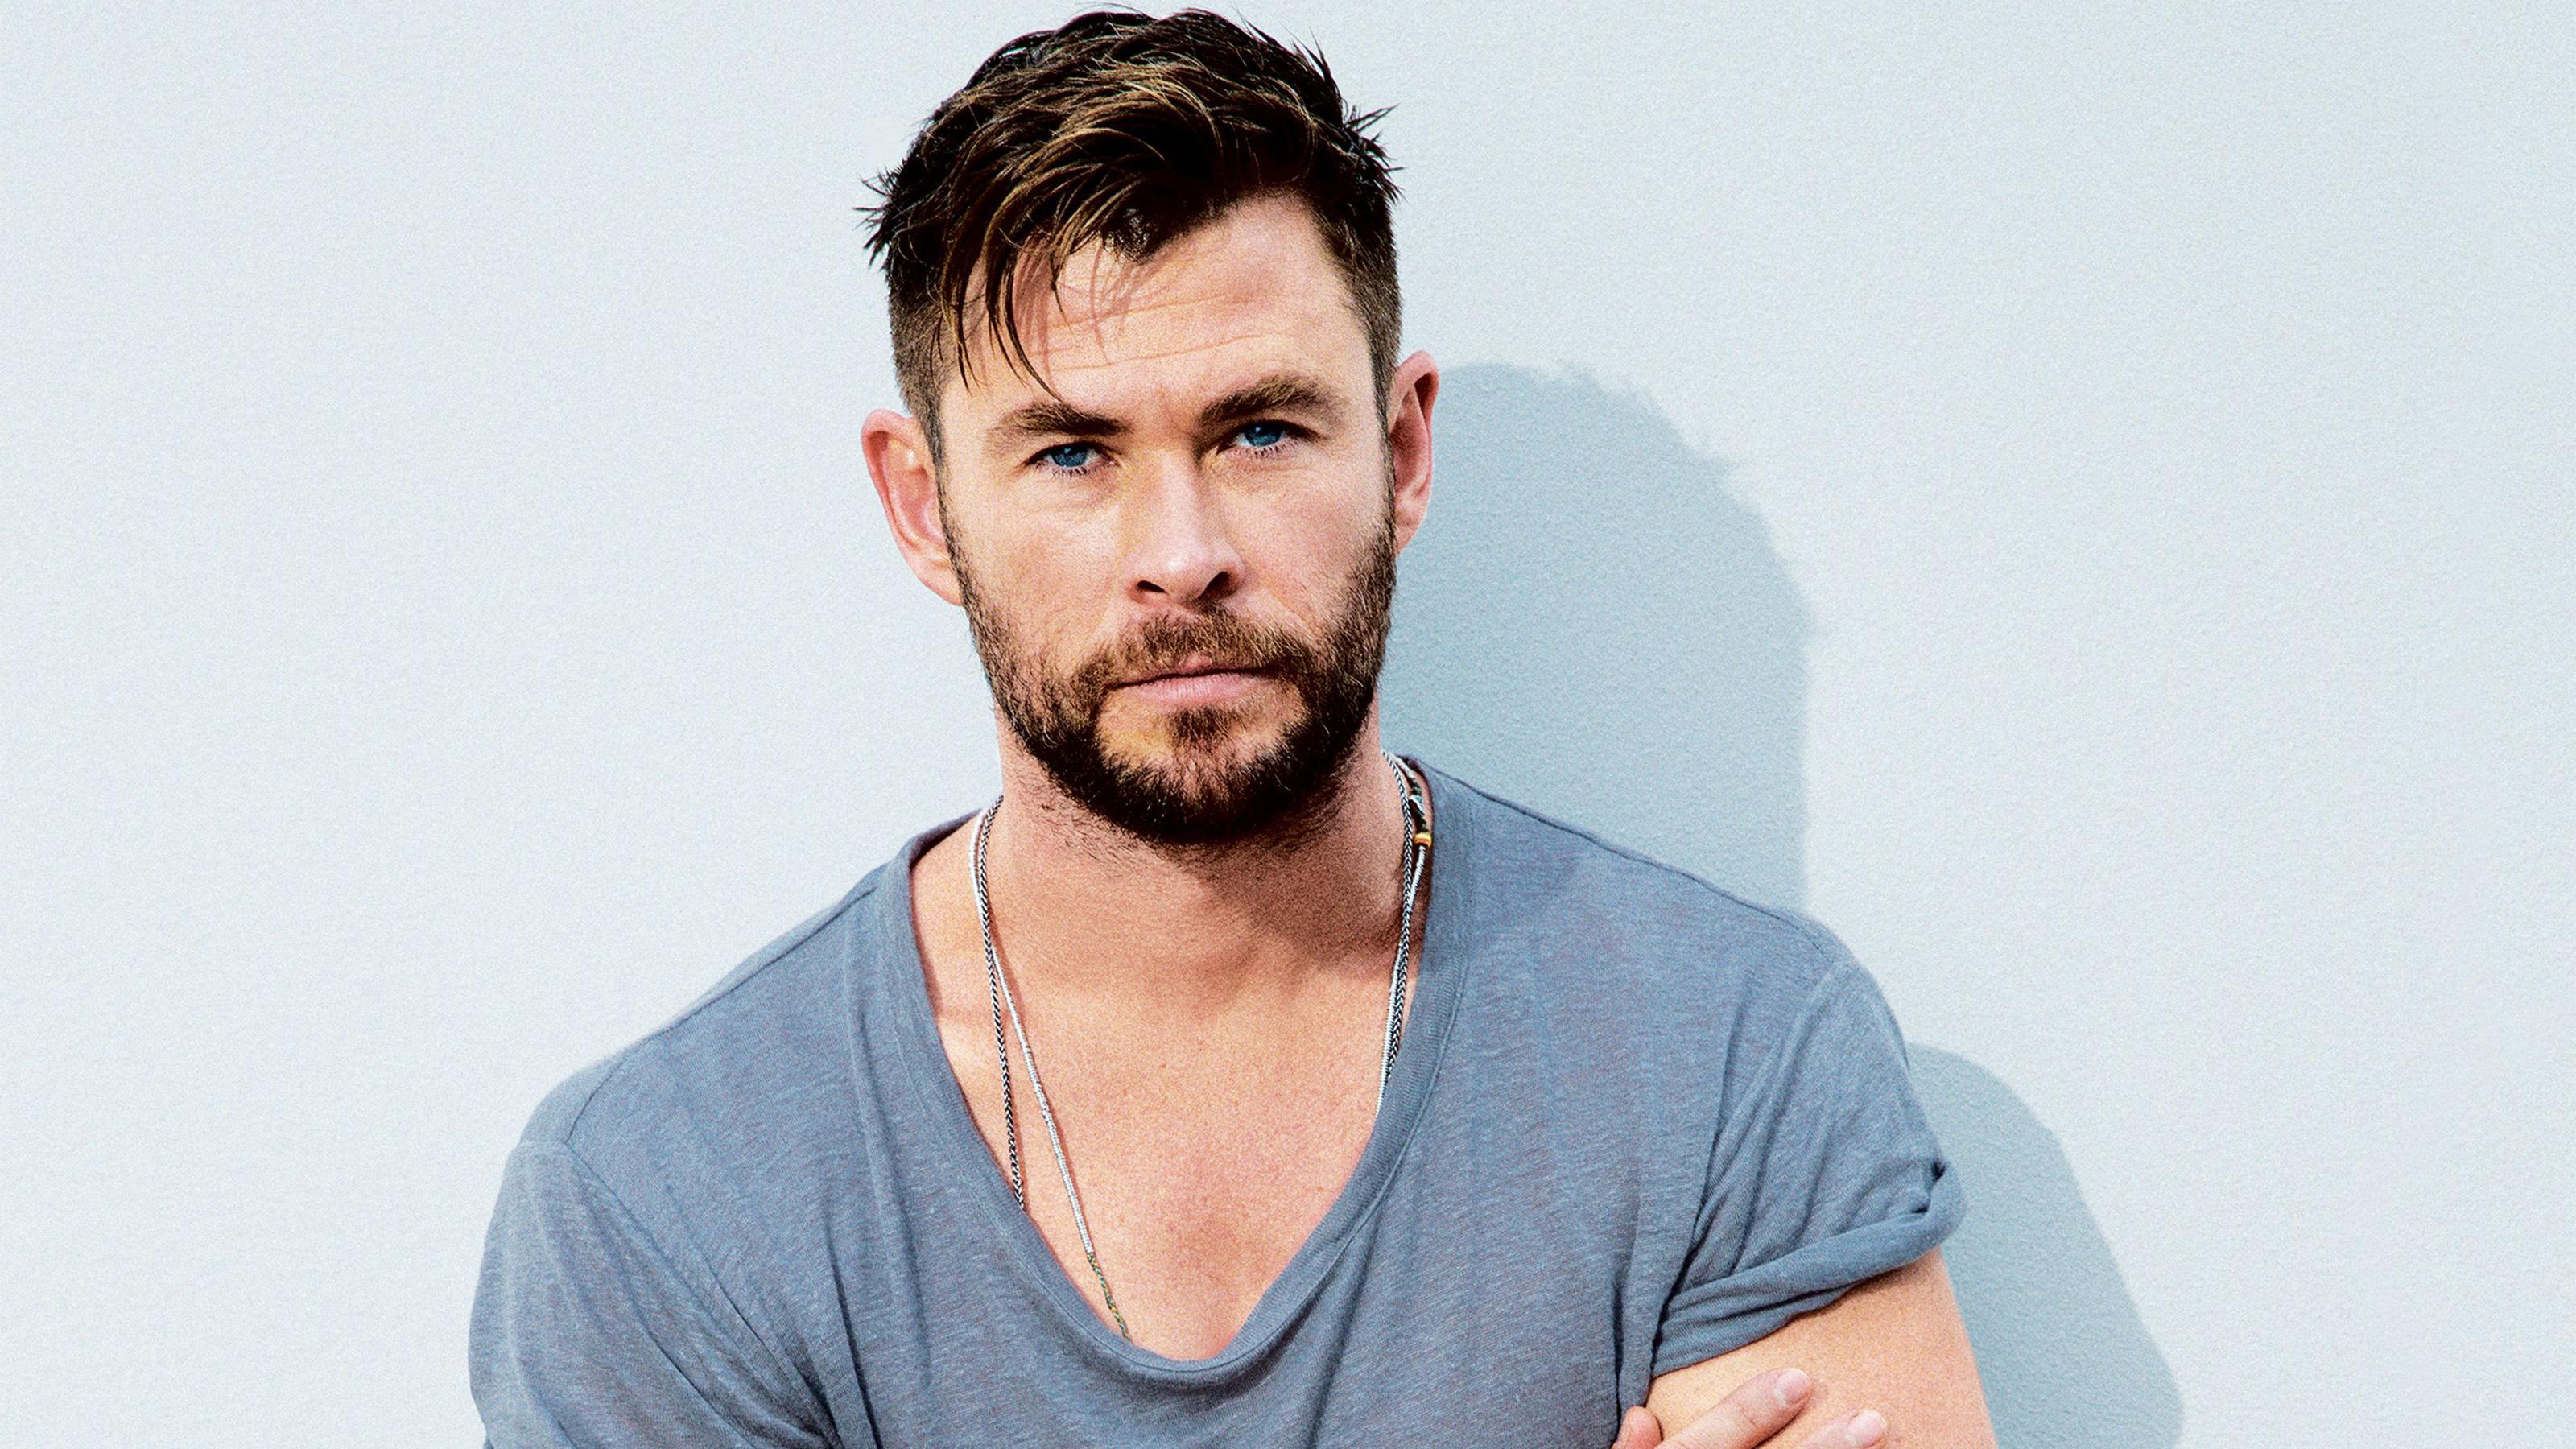 Chris Hemsworth Mens Health 2019 Hd Celebrities 4k